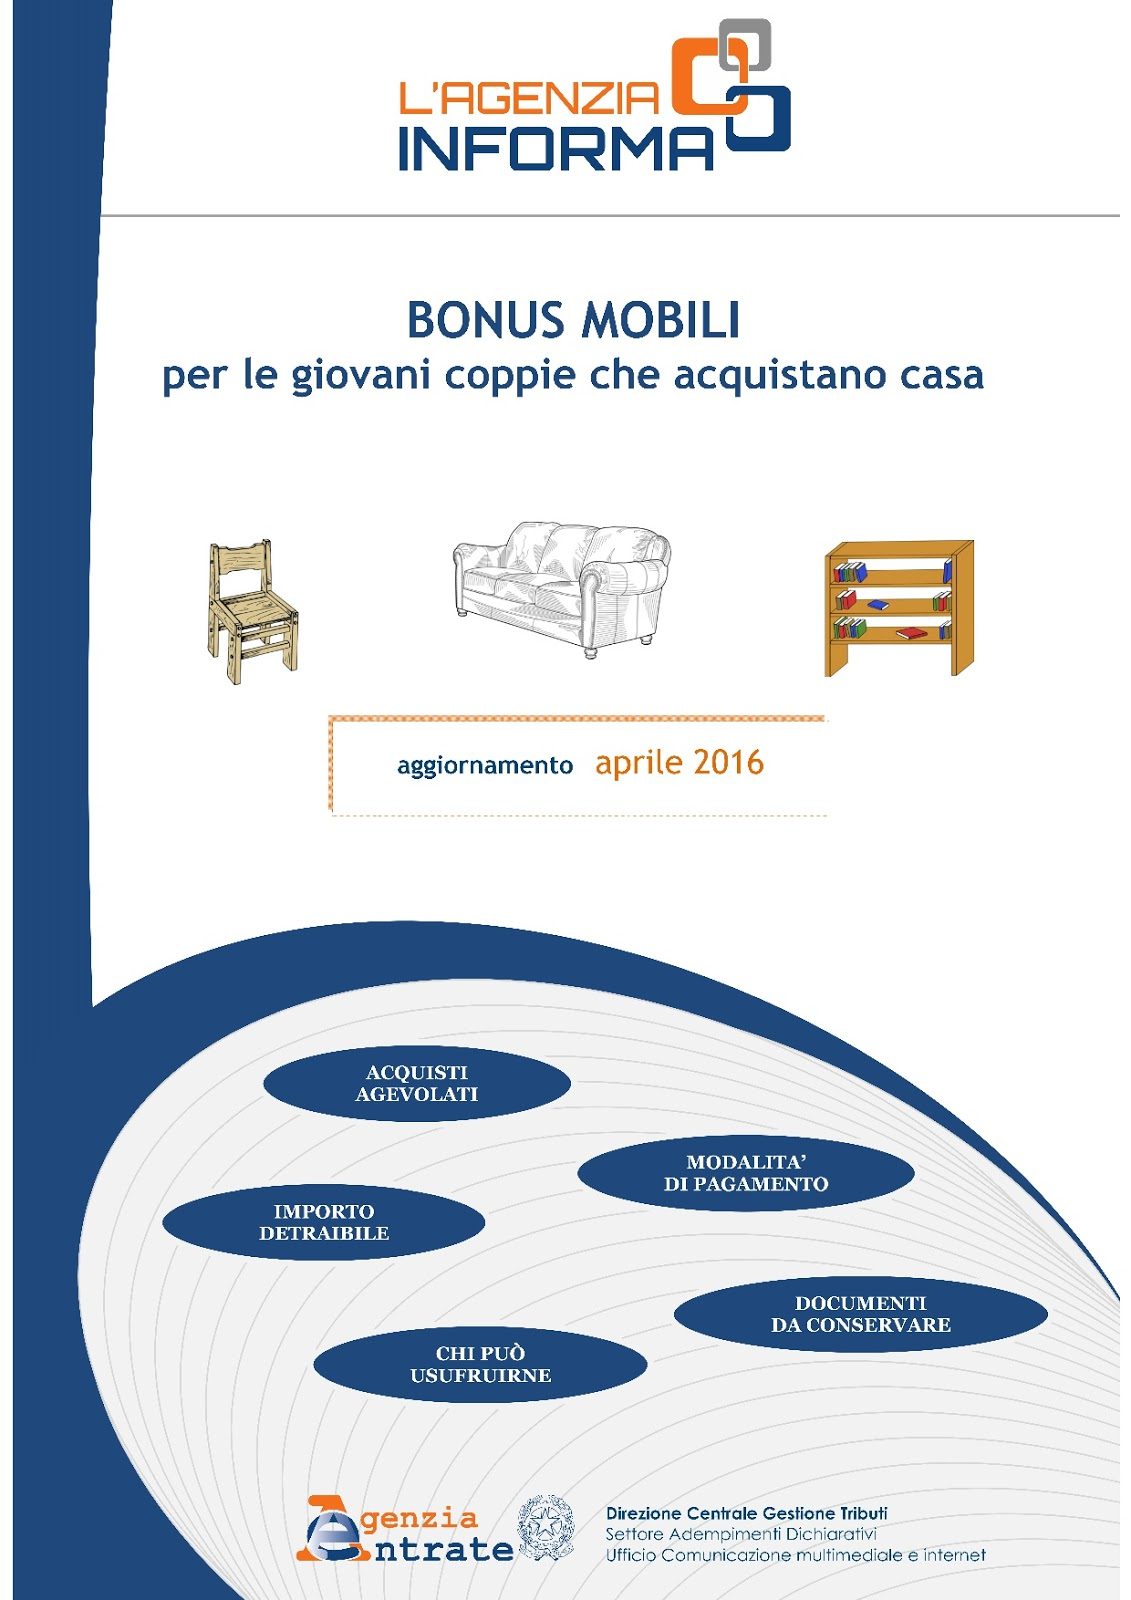 Fim cisl whirlpool melano marischio bonus mobili for Guida bonus mobili